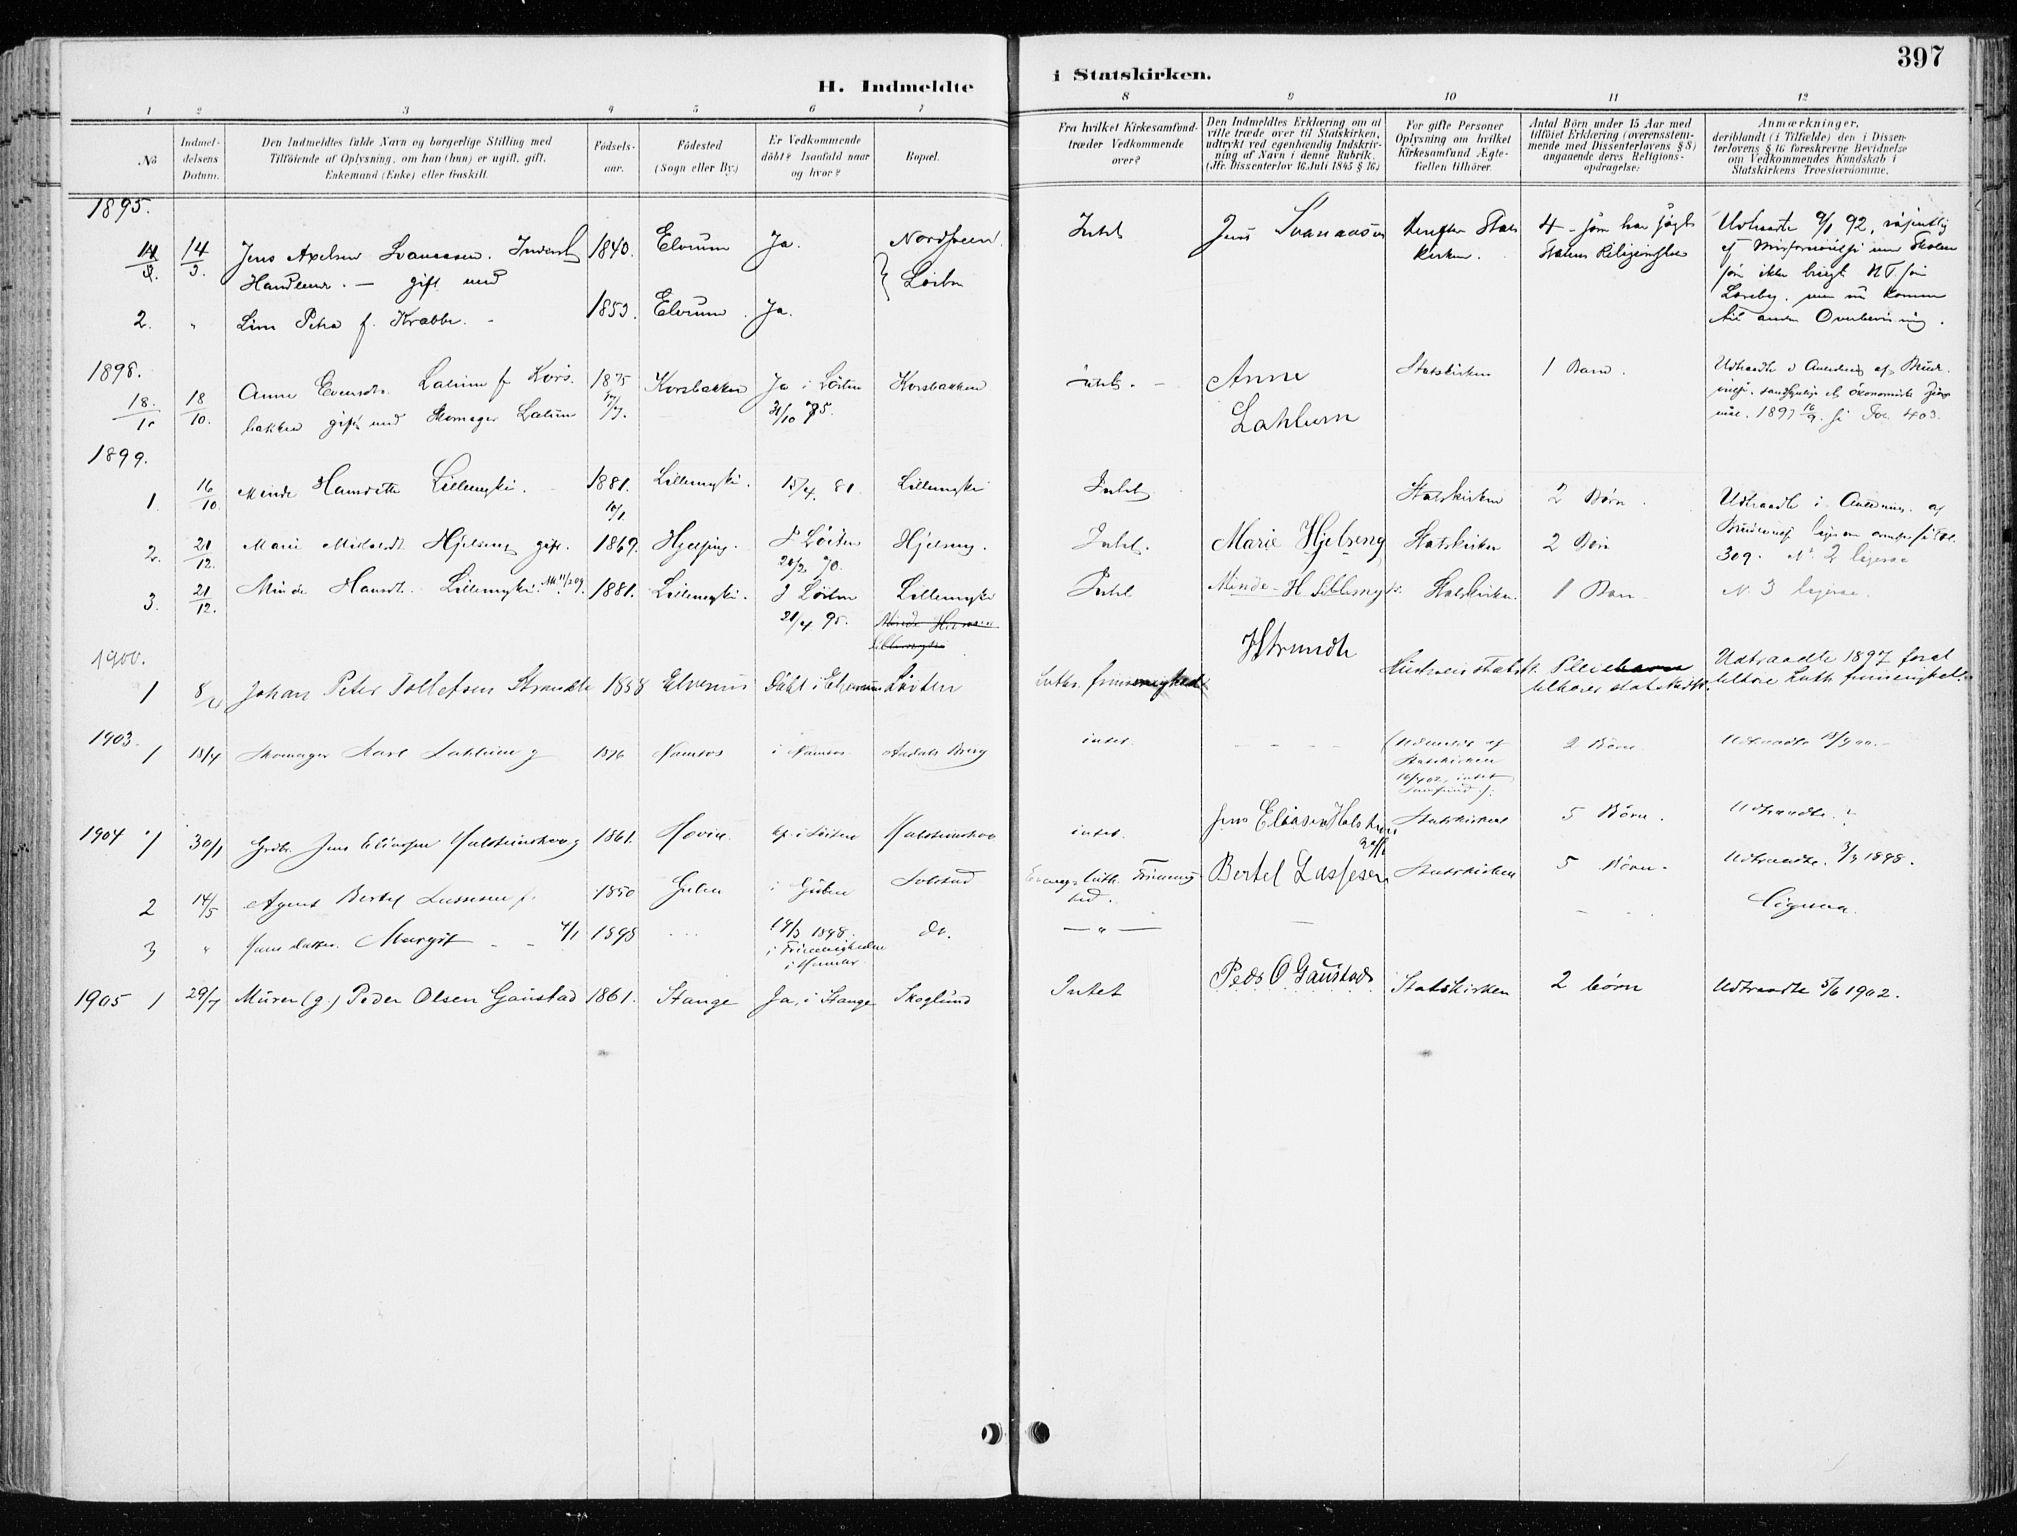 SAH, Løten prestekontor, K/Ka/L0010: Ministerialbok nr. 10, 1892-1907, s. 397